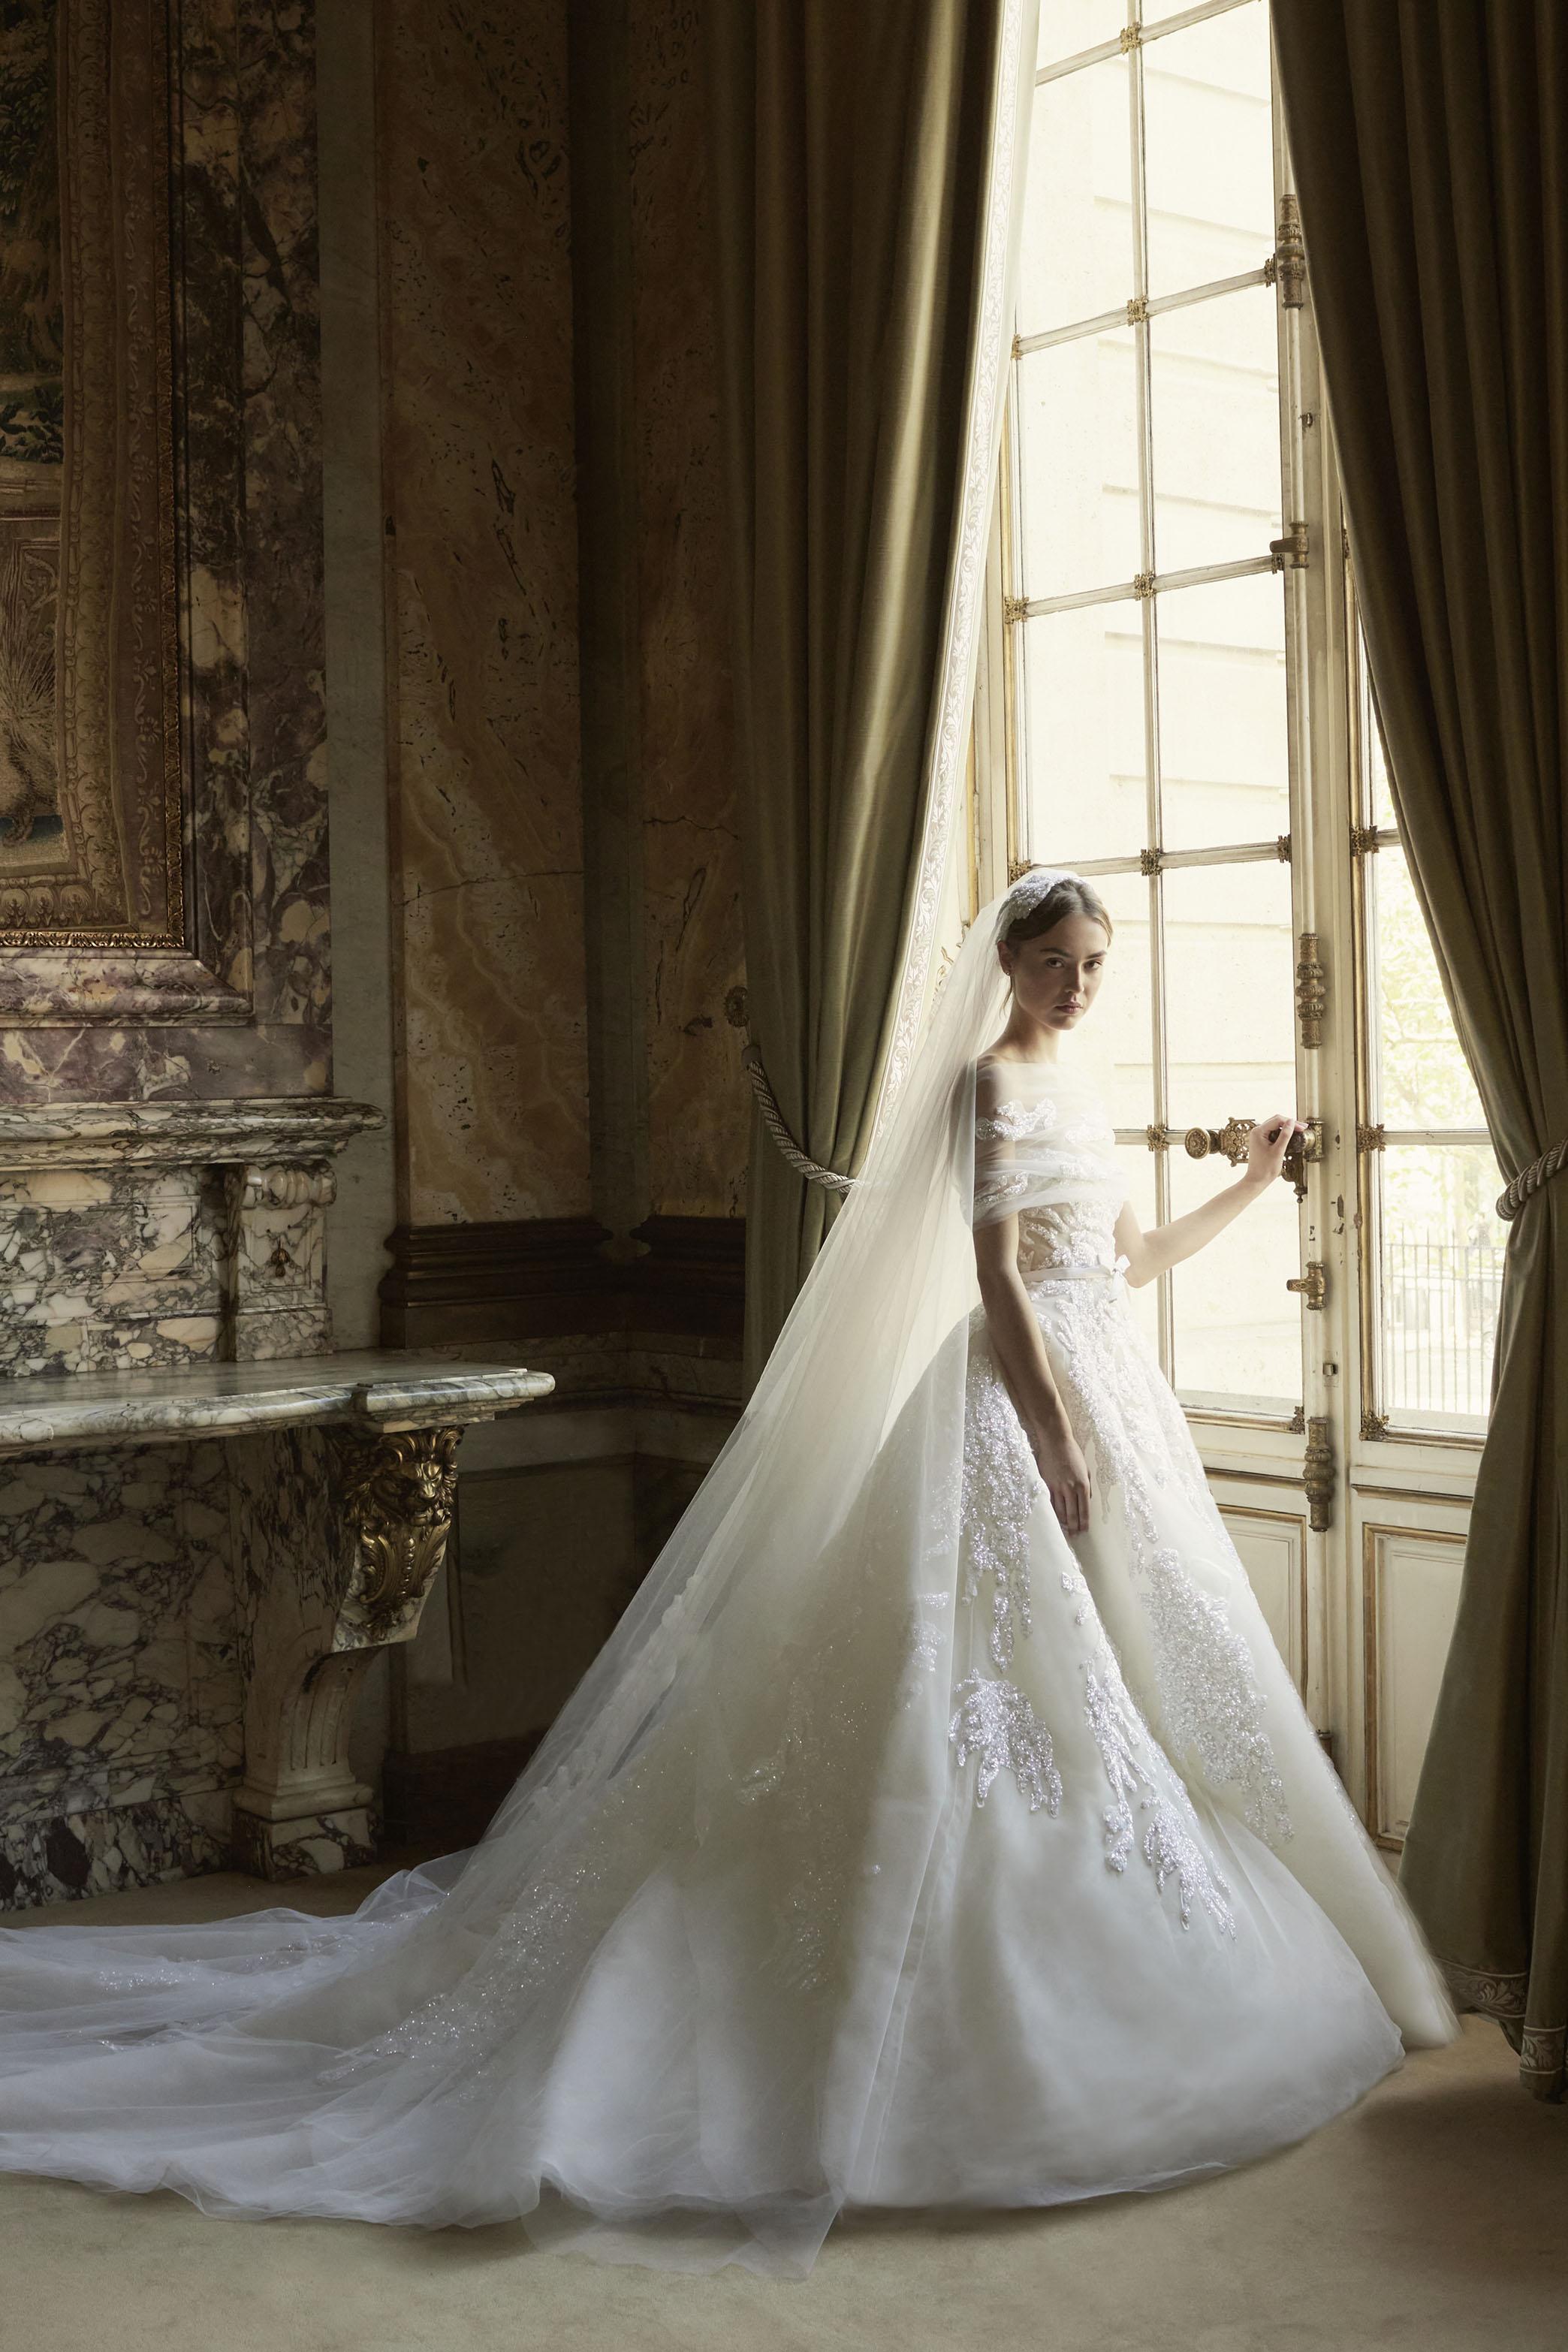 áo cưới nổi tiếng elie saab